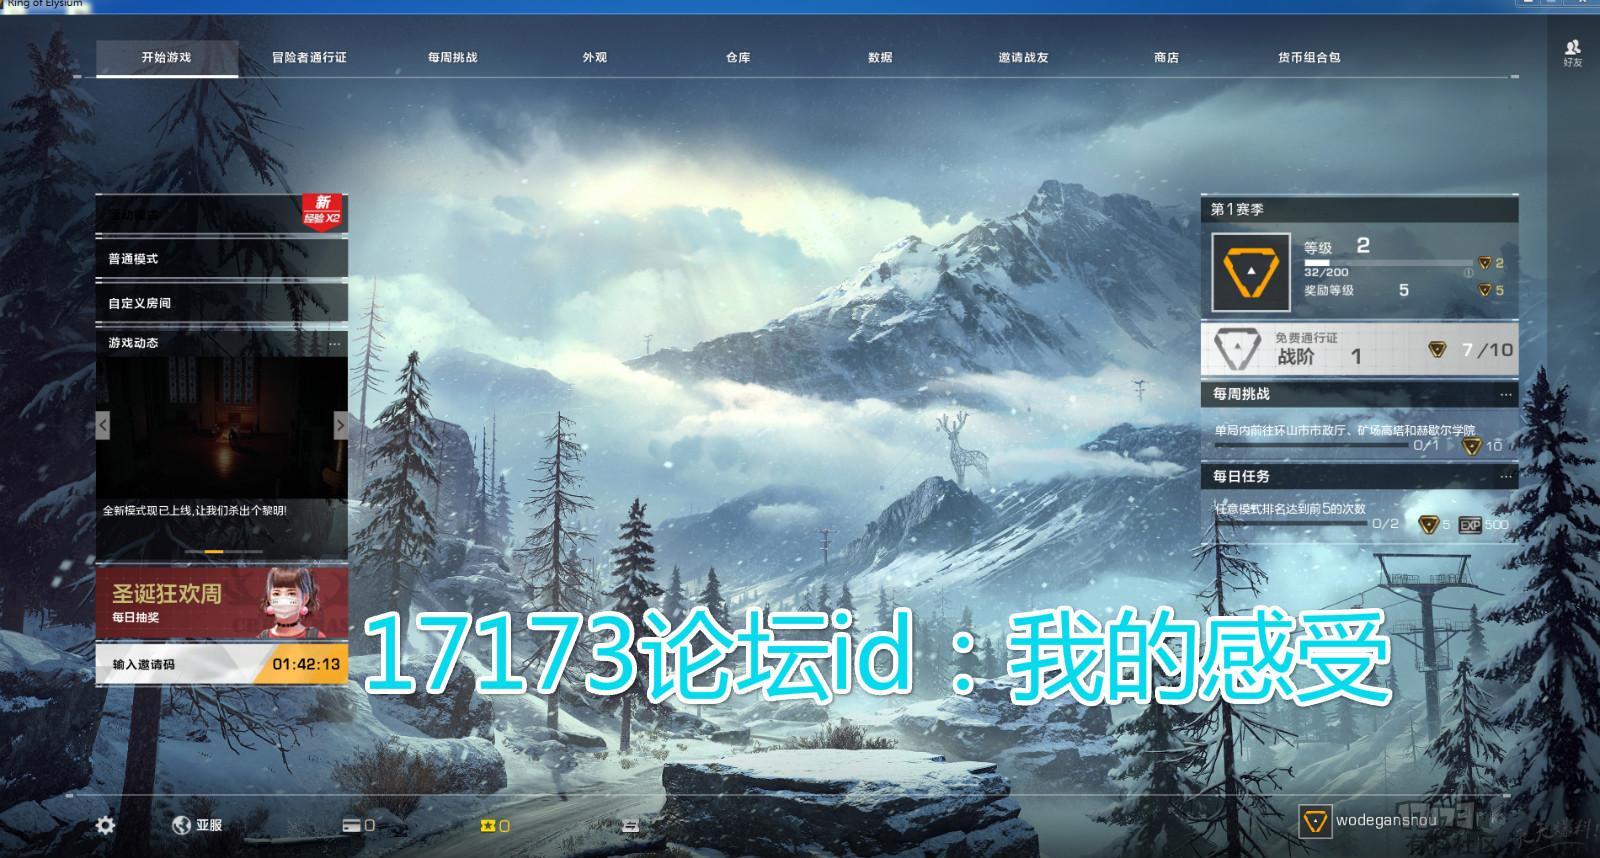 wuxianfaze1 (1)_meitu_5.jpg